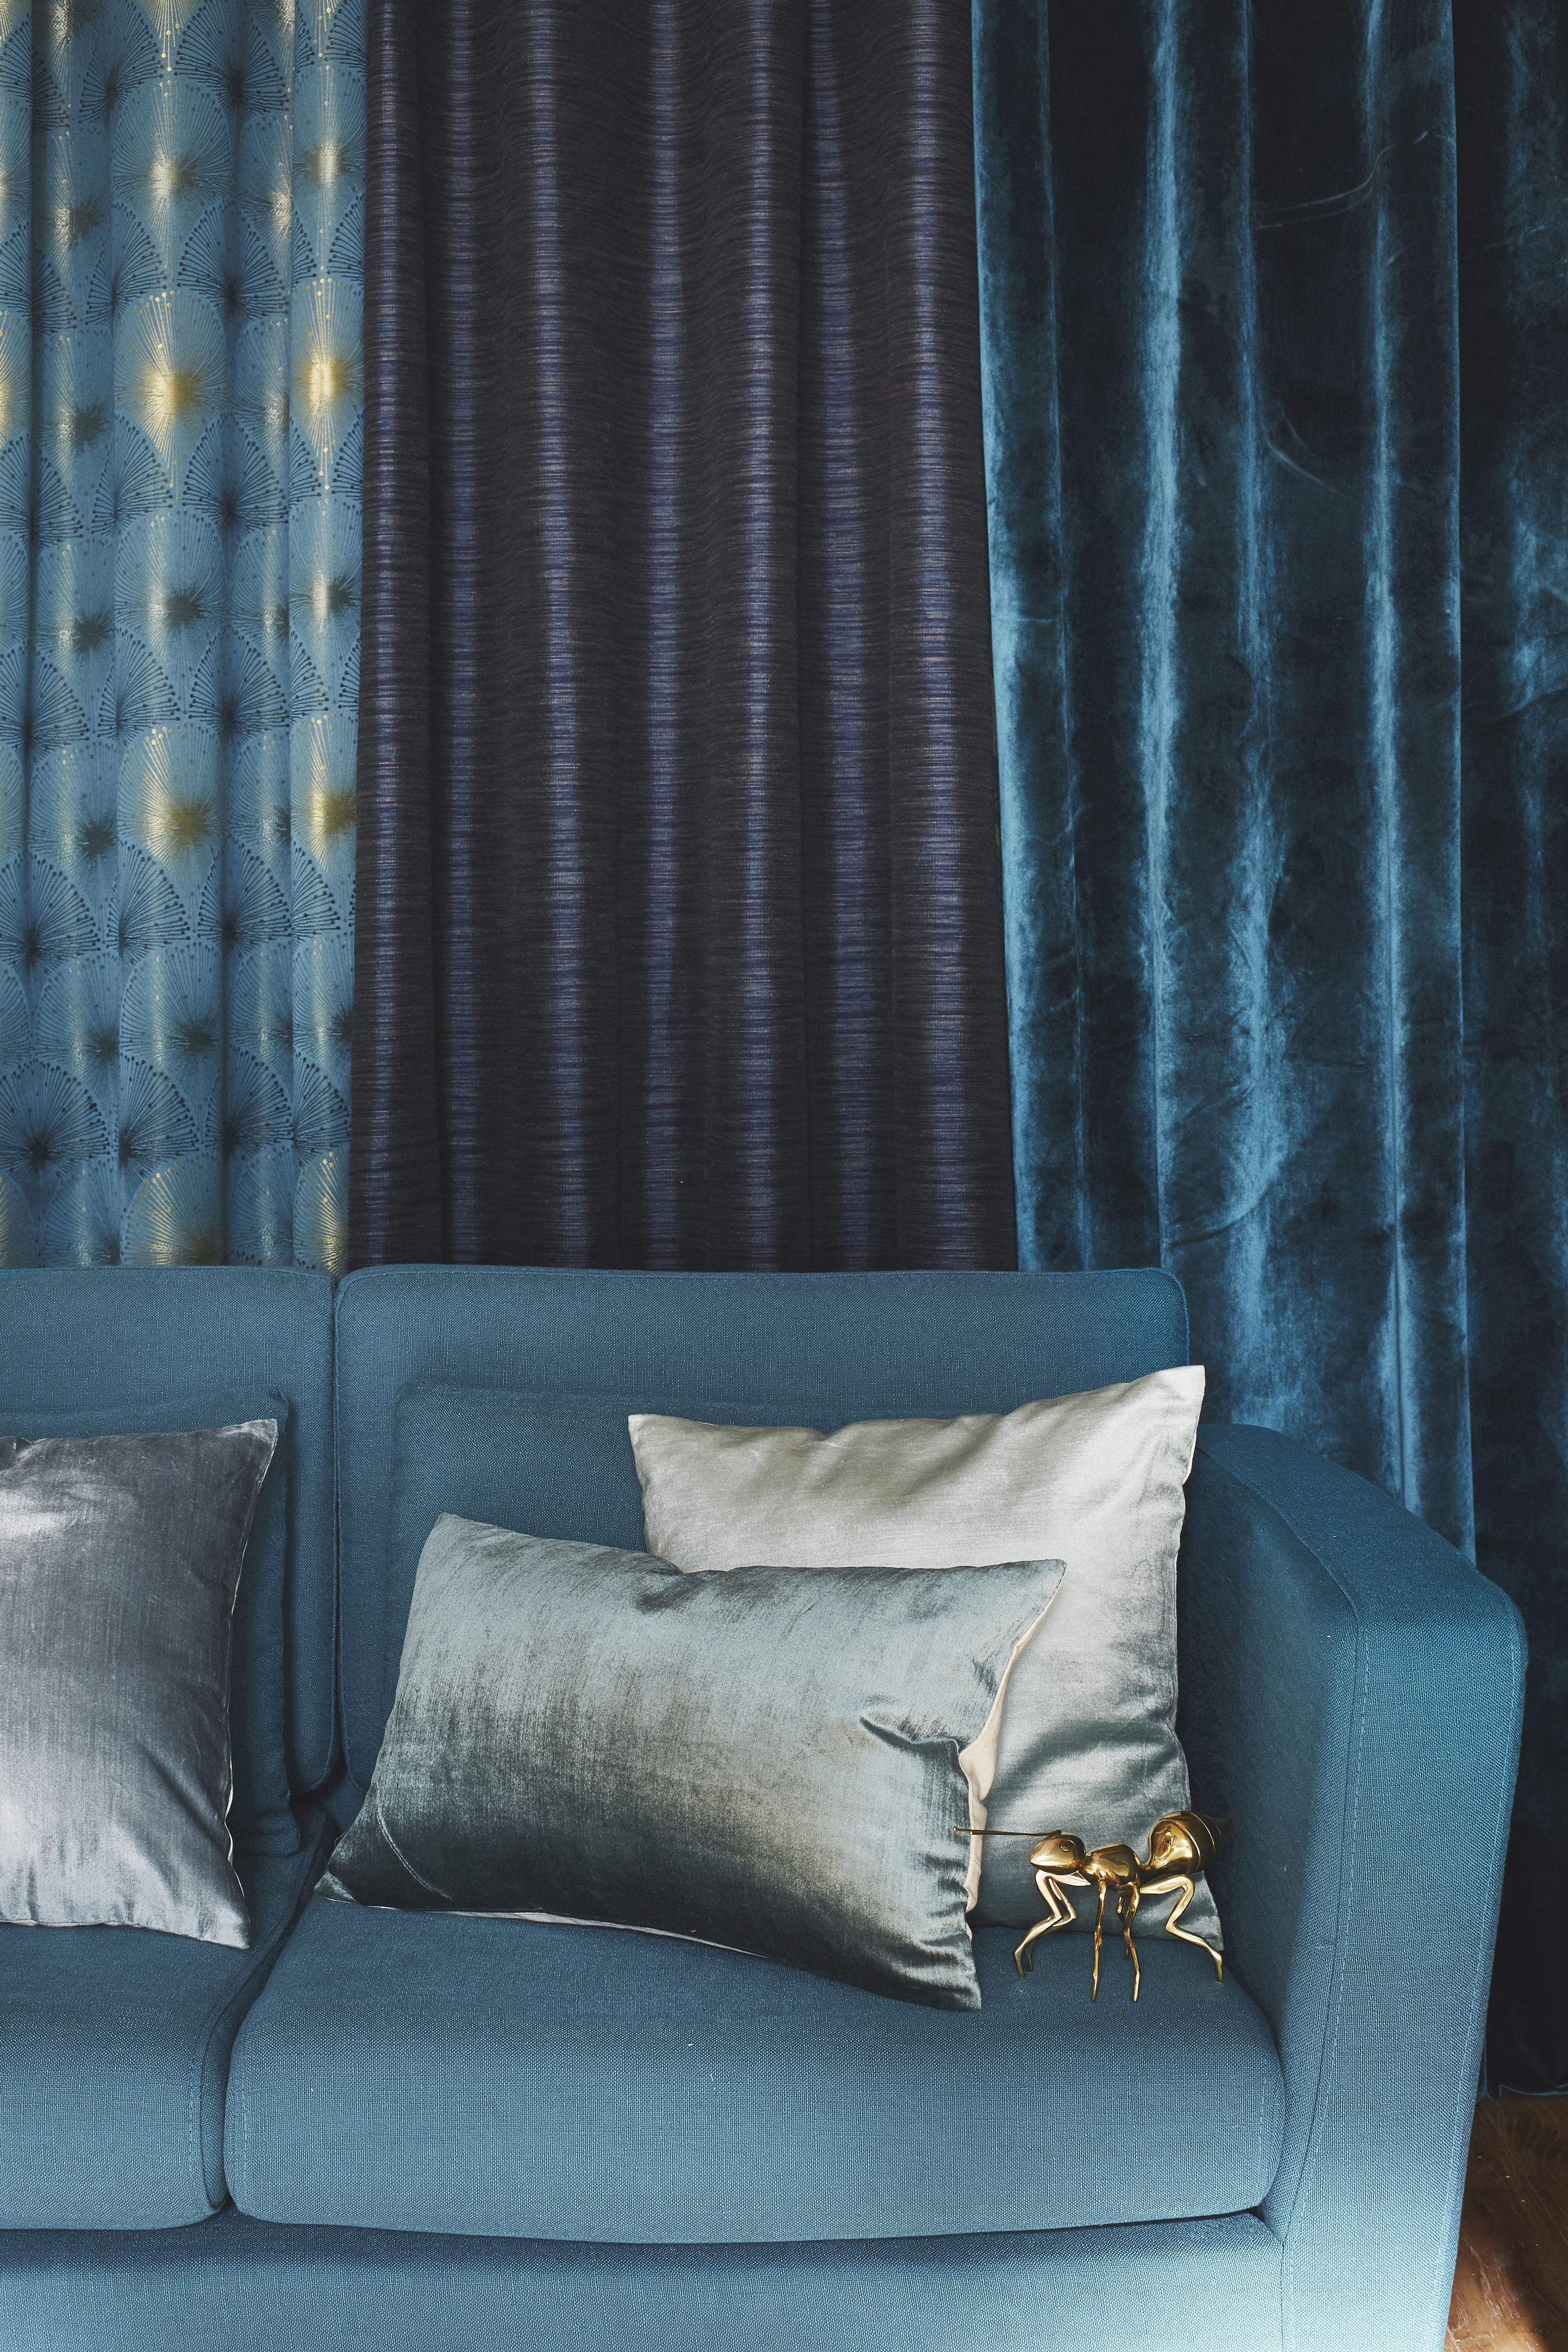 rideau tamisant grande hauteur everest vert l 140 x h 300 cm leroymerlin tendance eden blue rideau deco i rideaux salon tendance tendances deco salon